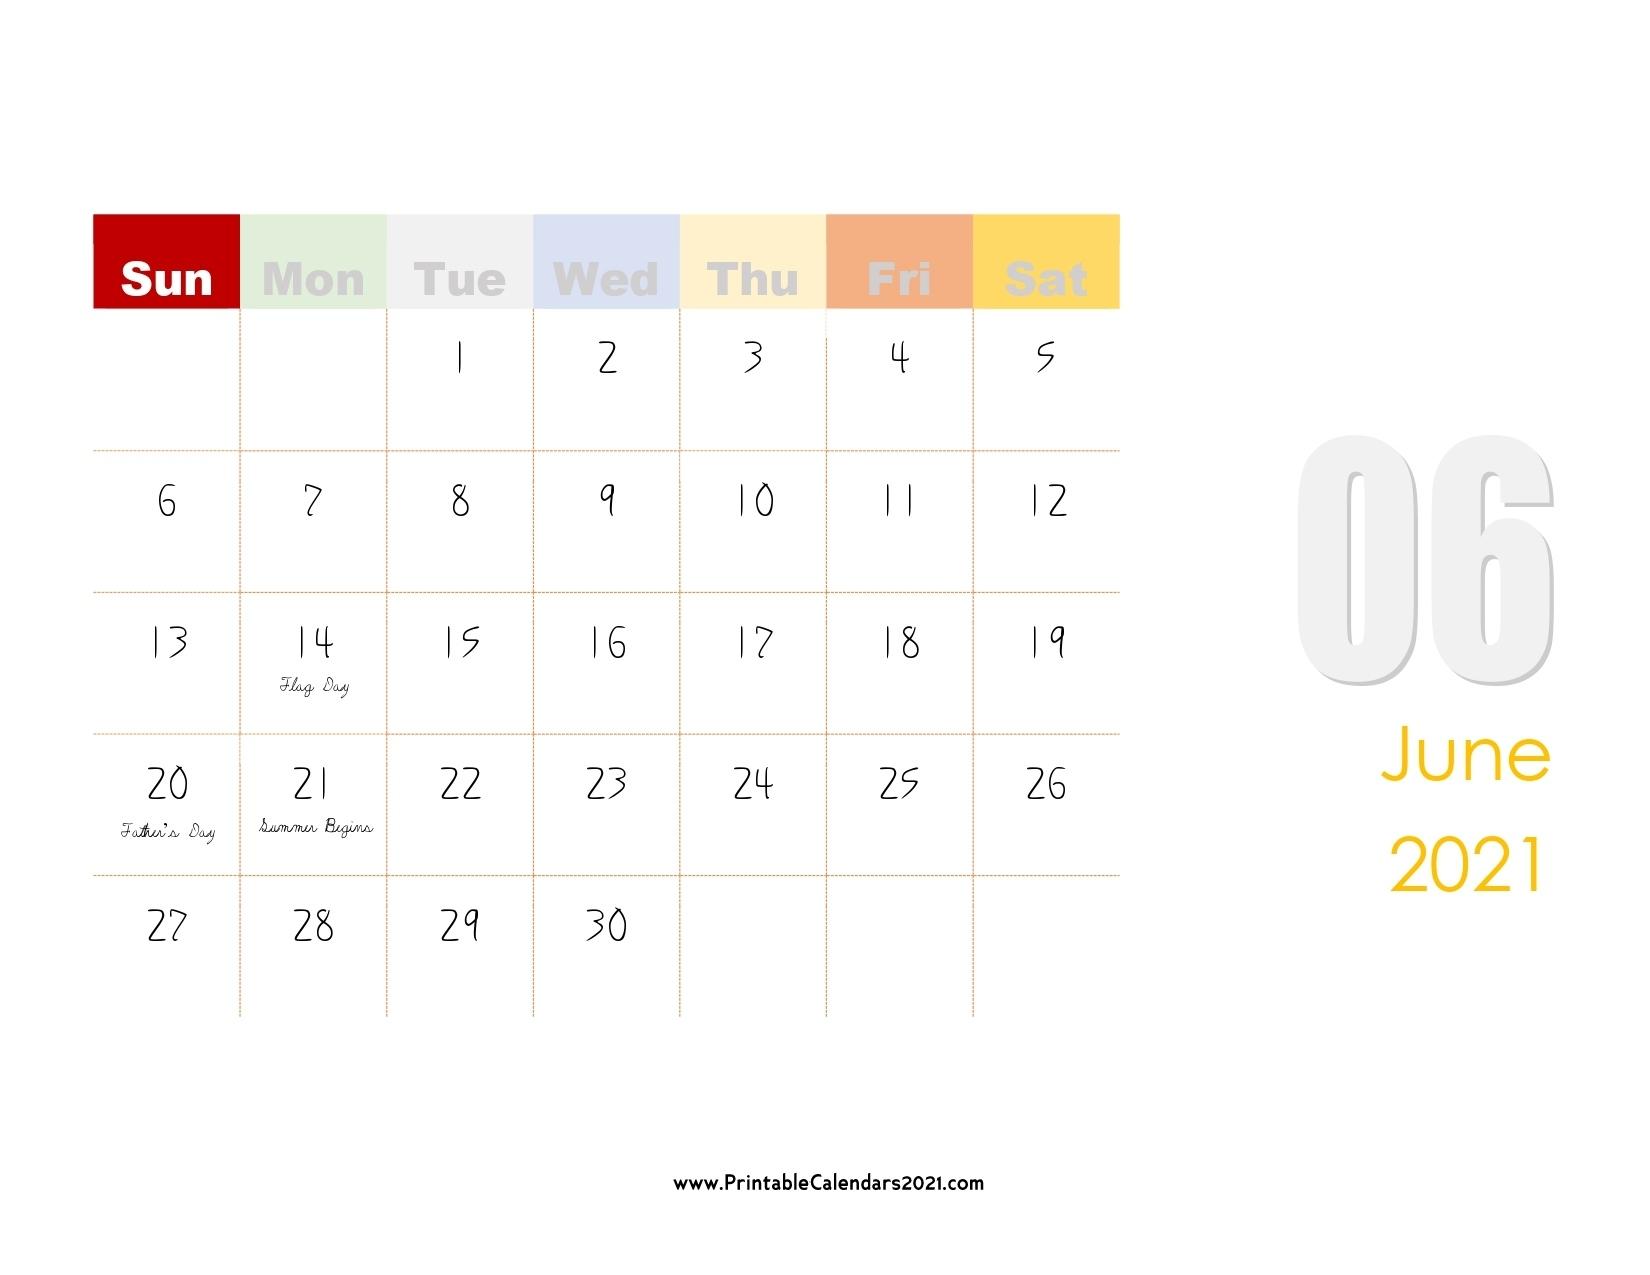 60+ Free June 2021 Calendar Printable With Holidays, Blank, Pdf June 2021 Calendar With Holidays Printable